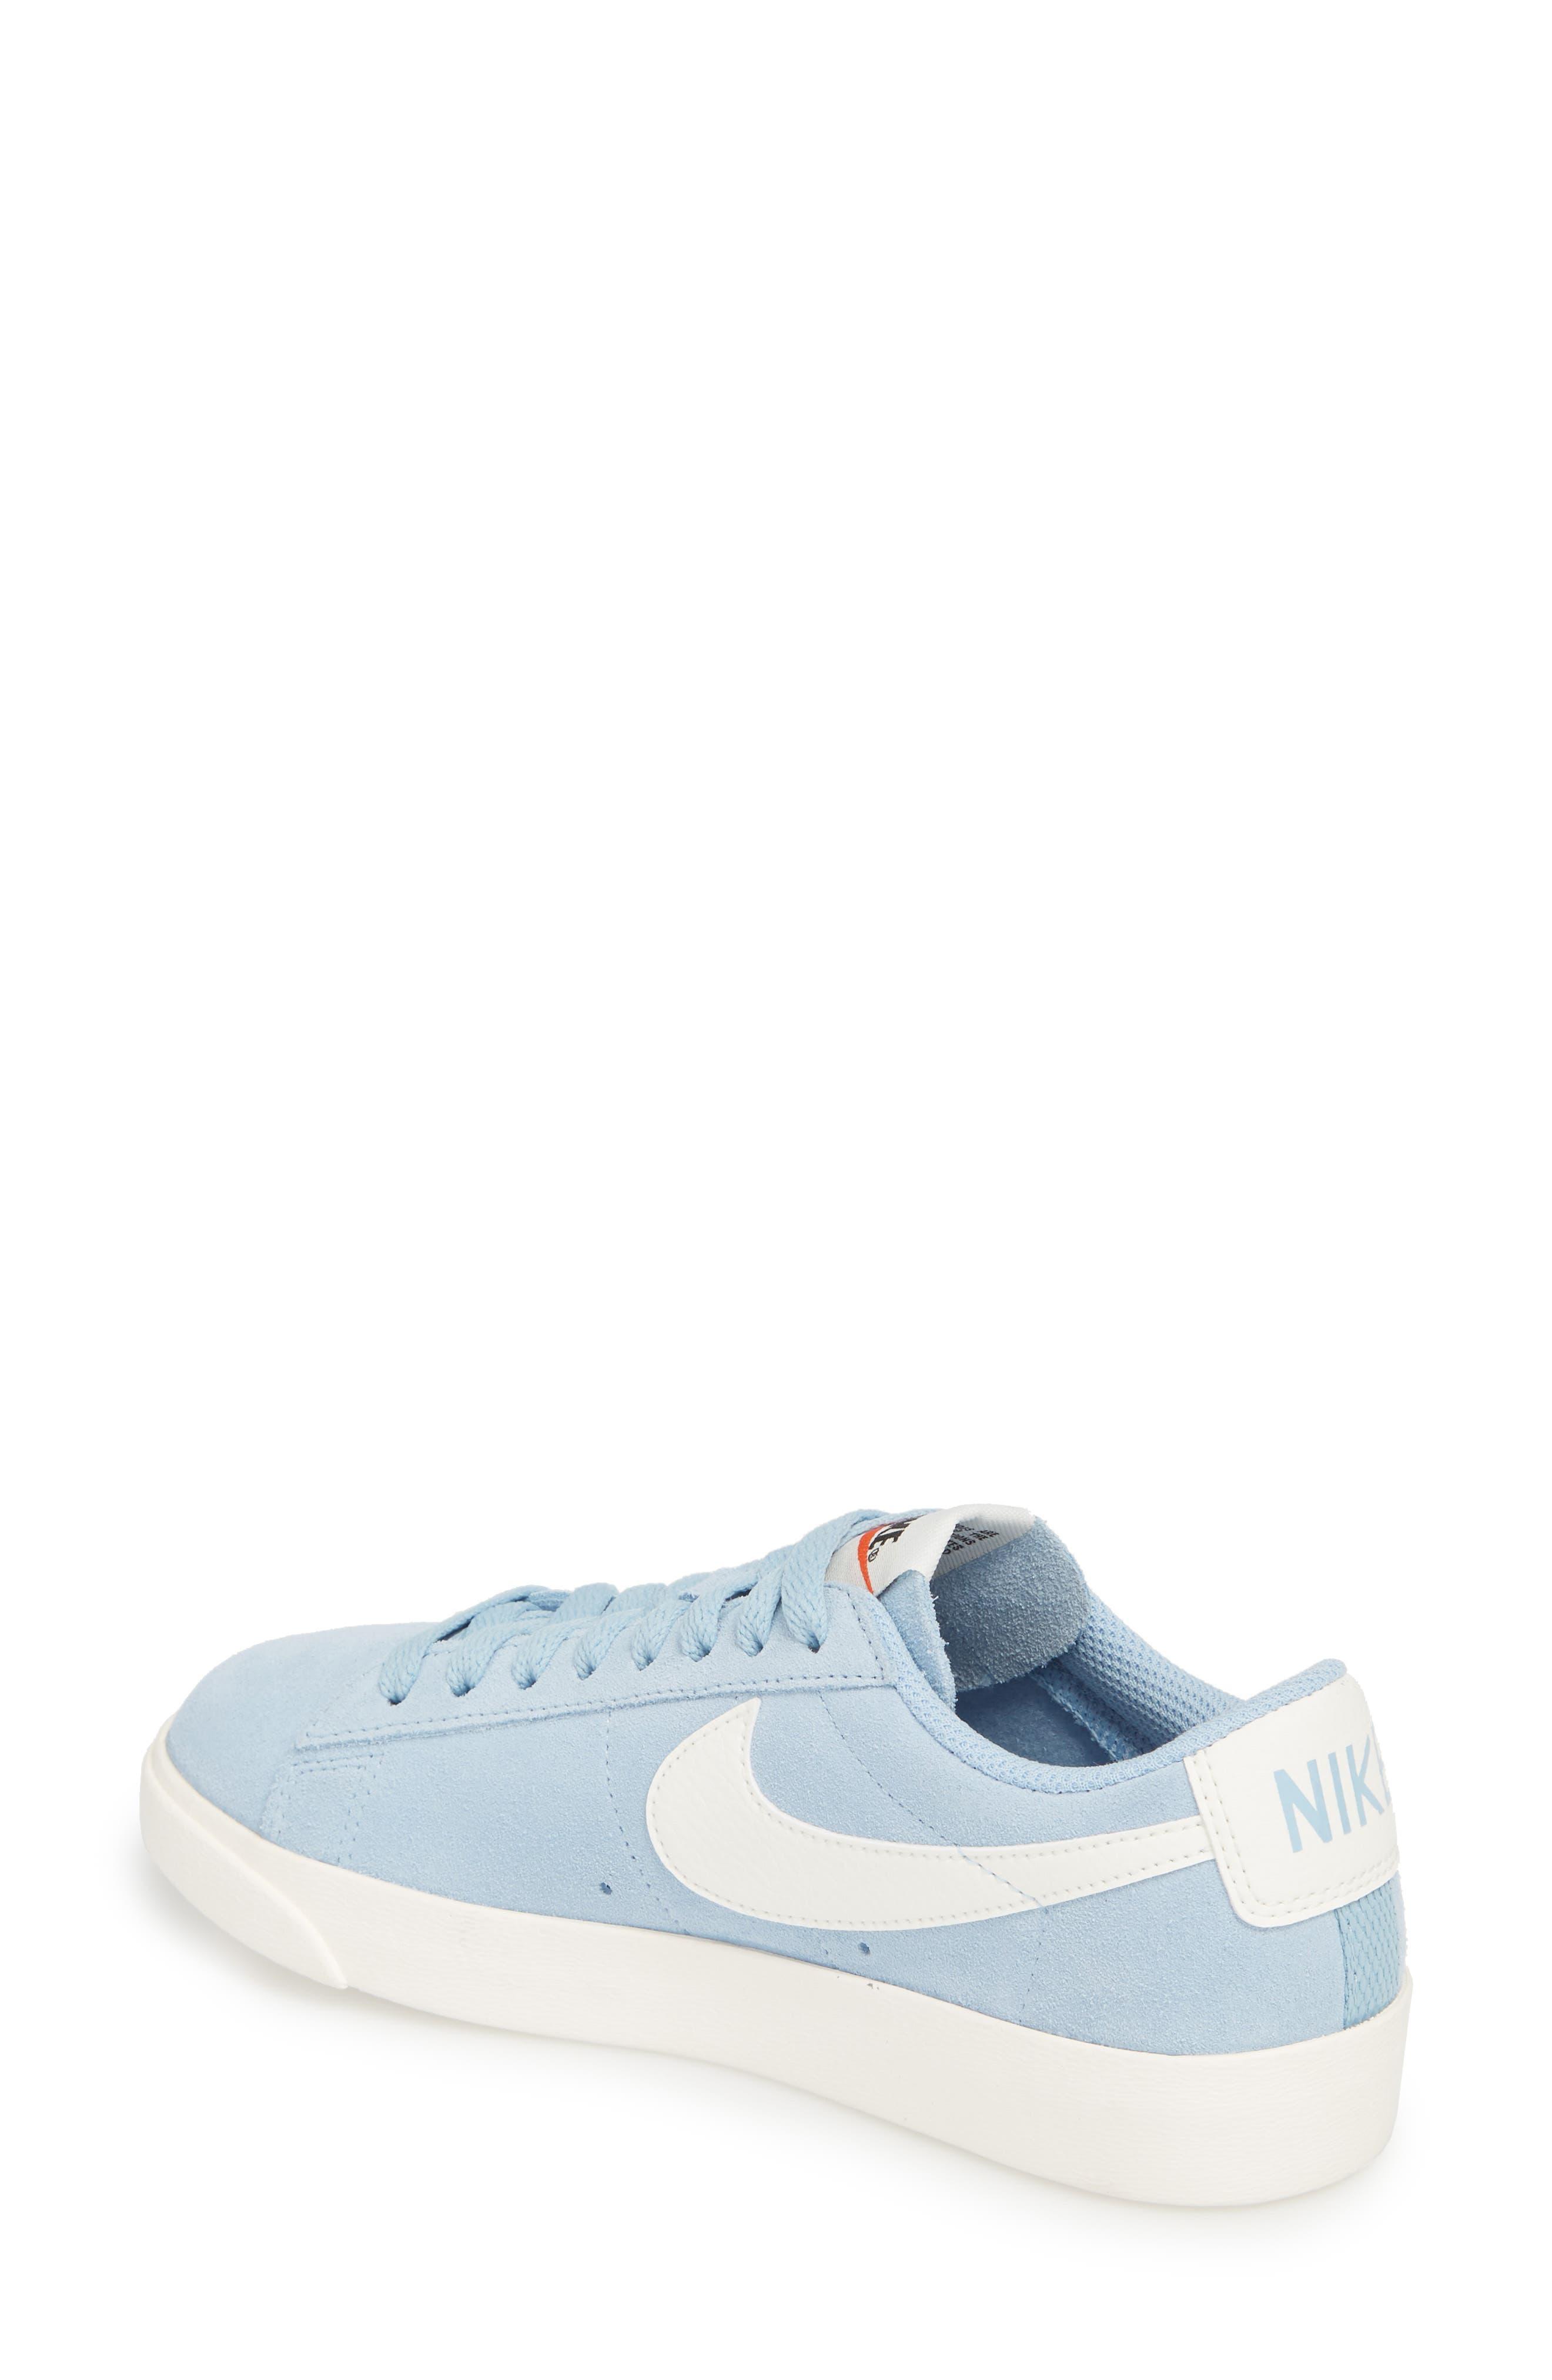 Blazer Low Sneaker,                             Alternate thumbnail 9, color,